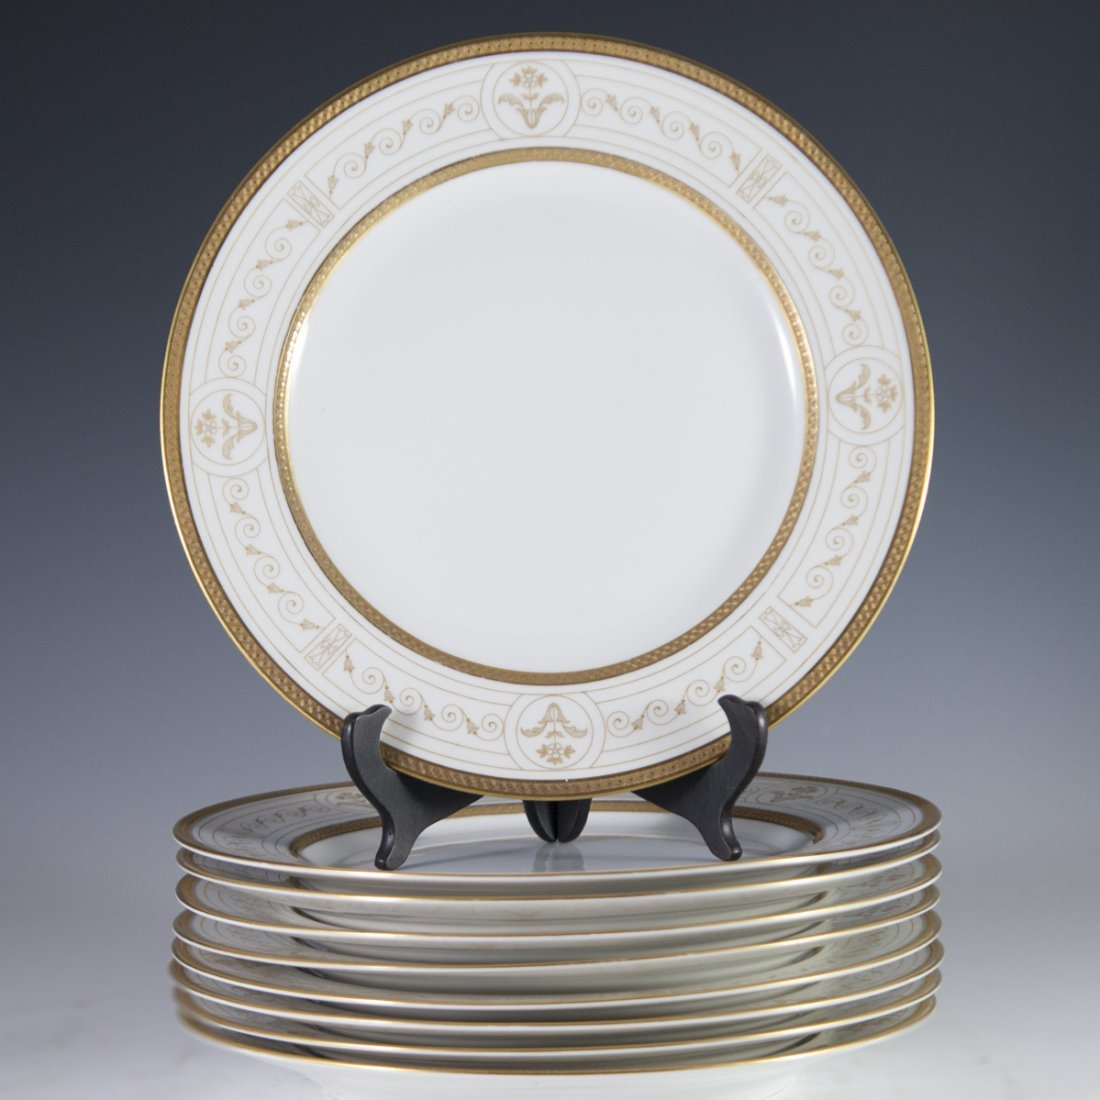 Rosenthal Continental Gilded & Enameled Dinner Plates